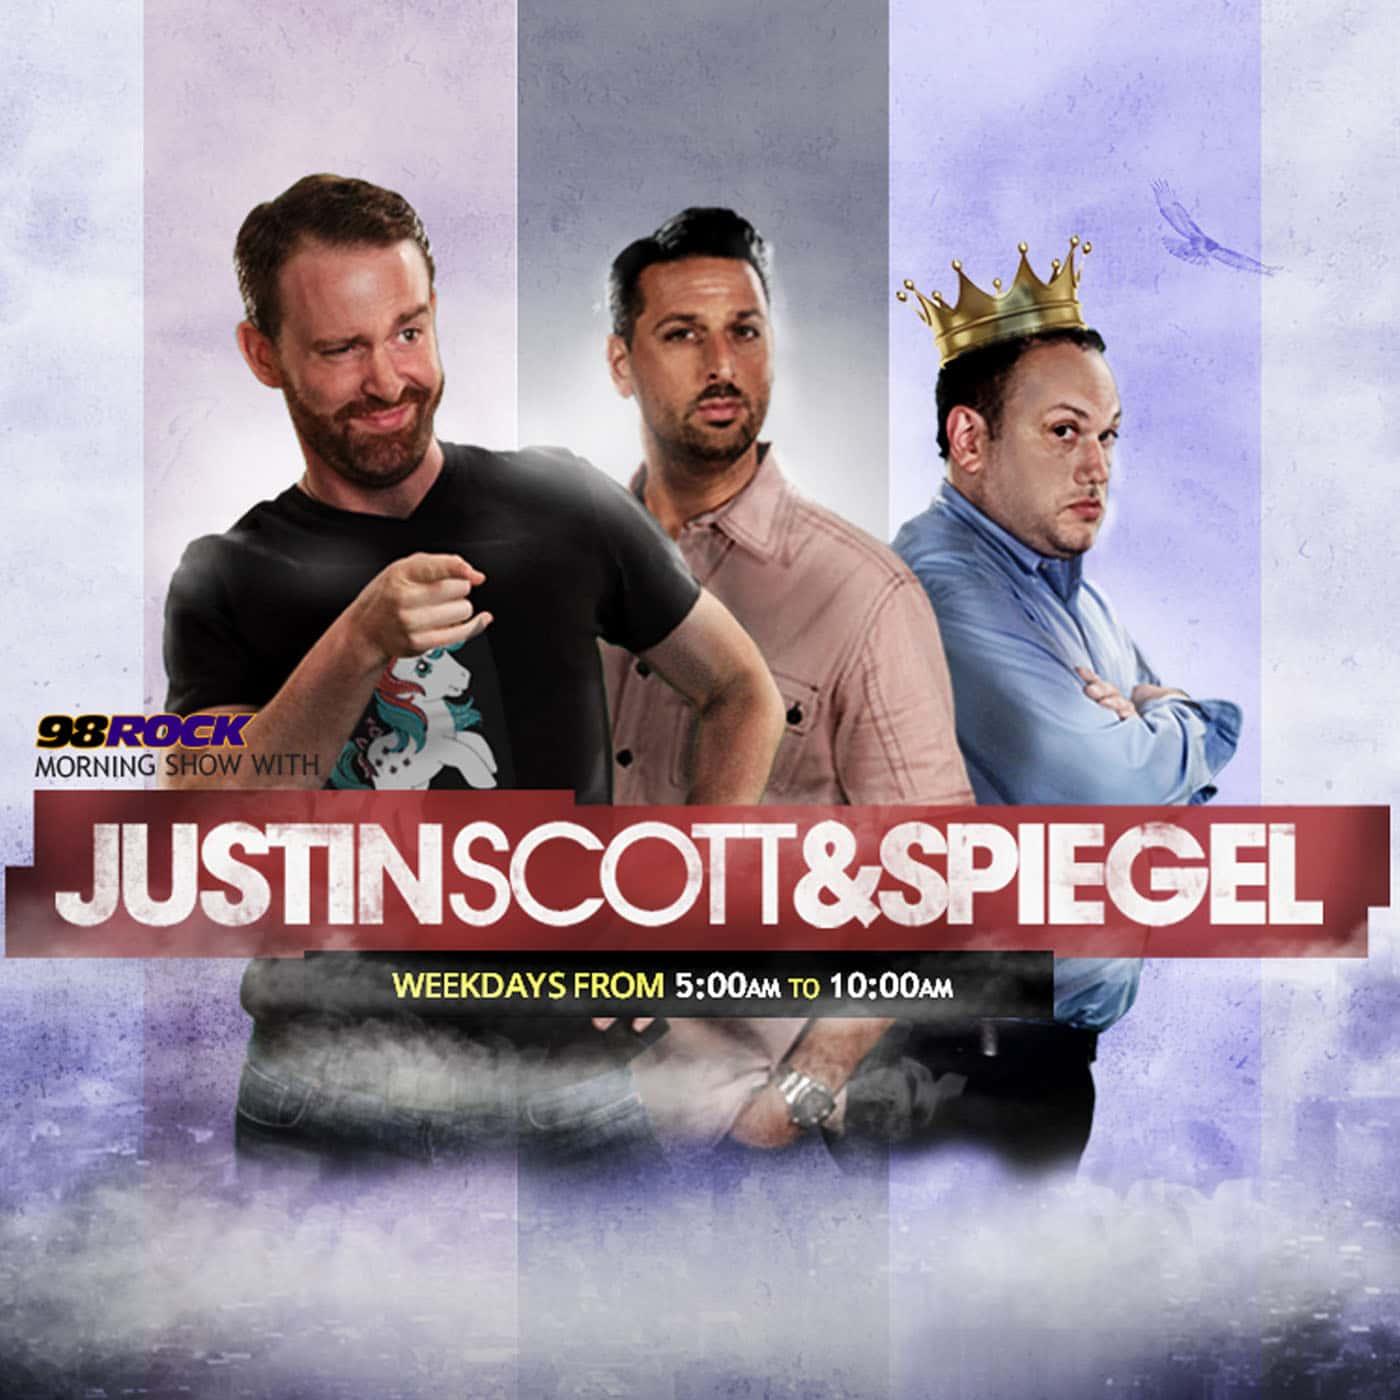 Justin, Scott and Spiegel Show Highlights